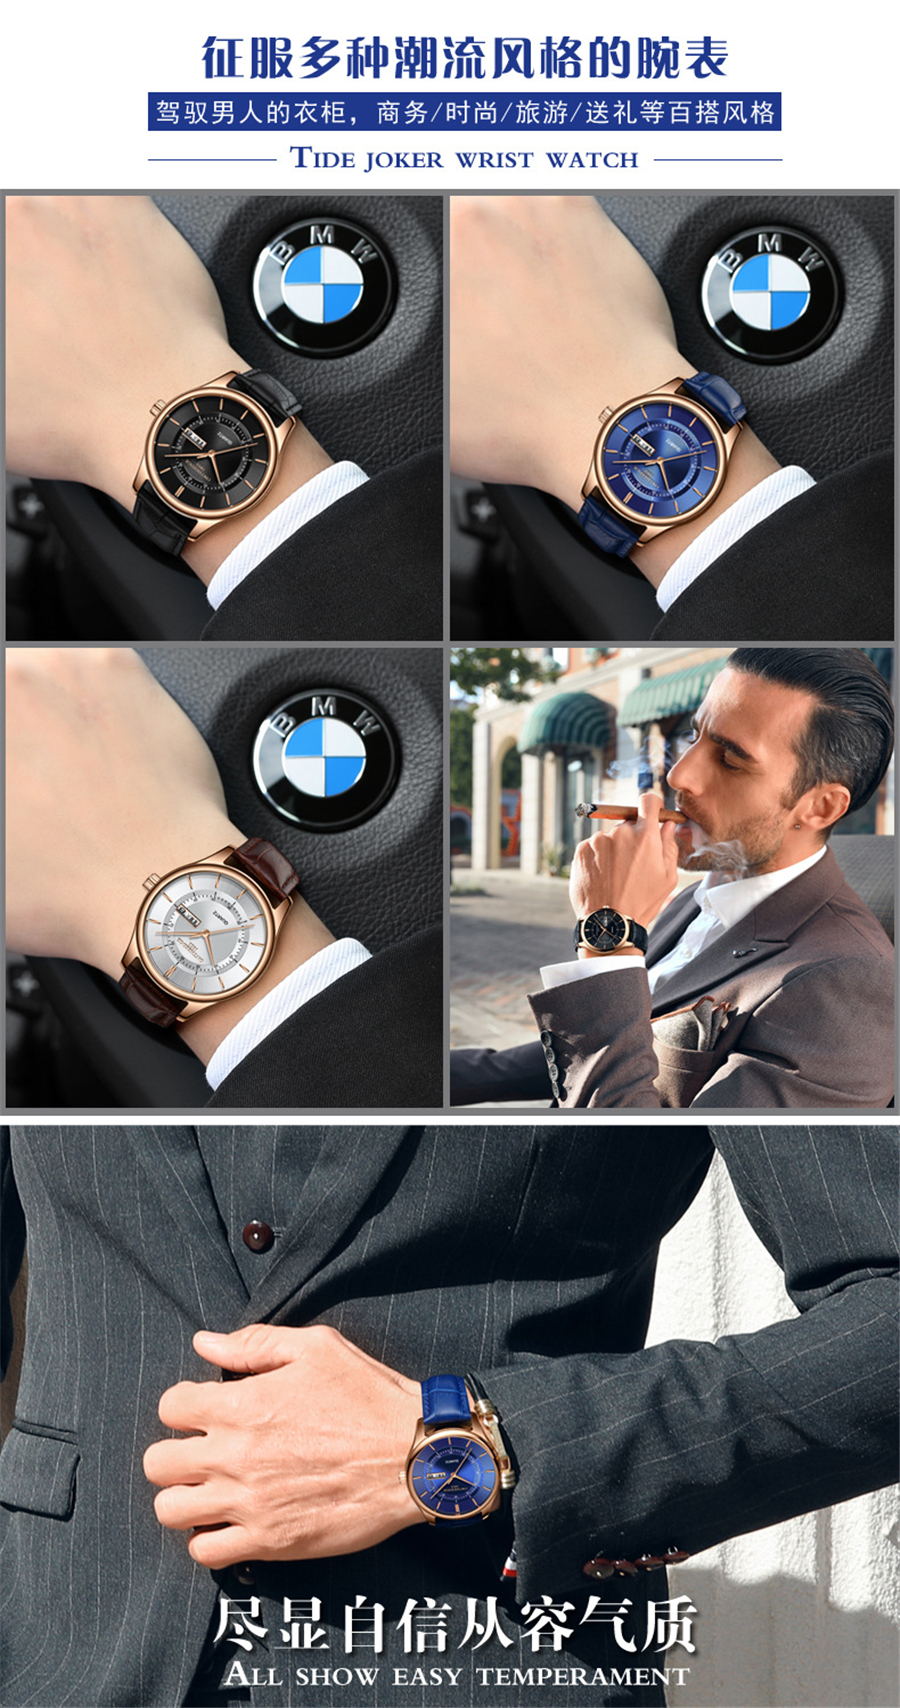 HTB1M2XjcyMnBKNjSZFoq6zOSFXac High Quality Rose Gold Dial Watch Men Leather Waterproof 30M Watches Business Fashion Japan Quartz Movement Auto Date Male Clock